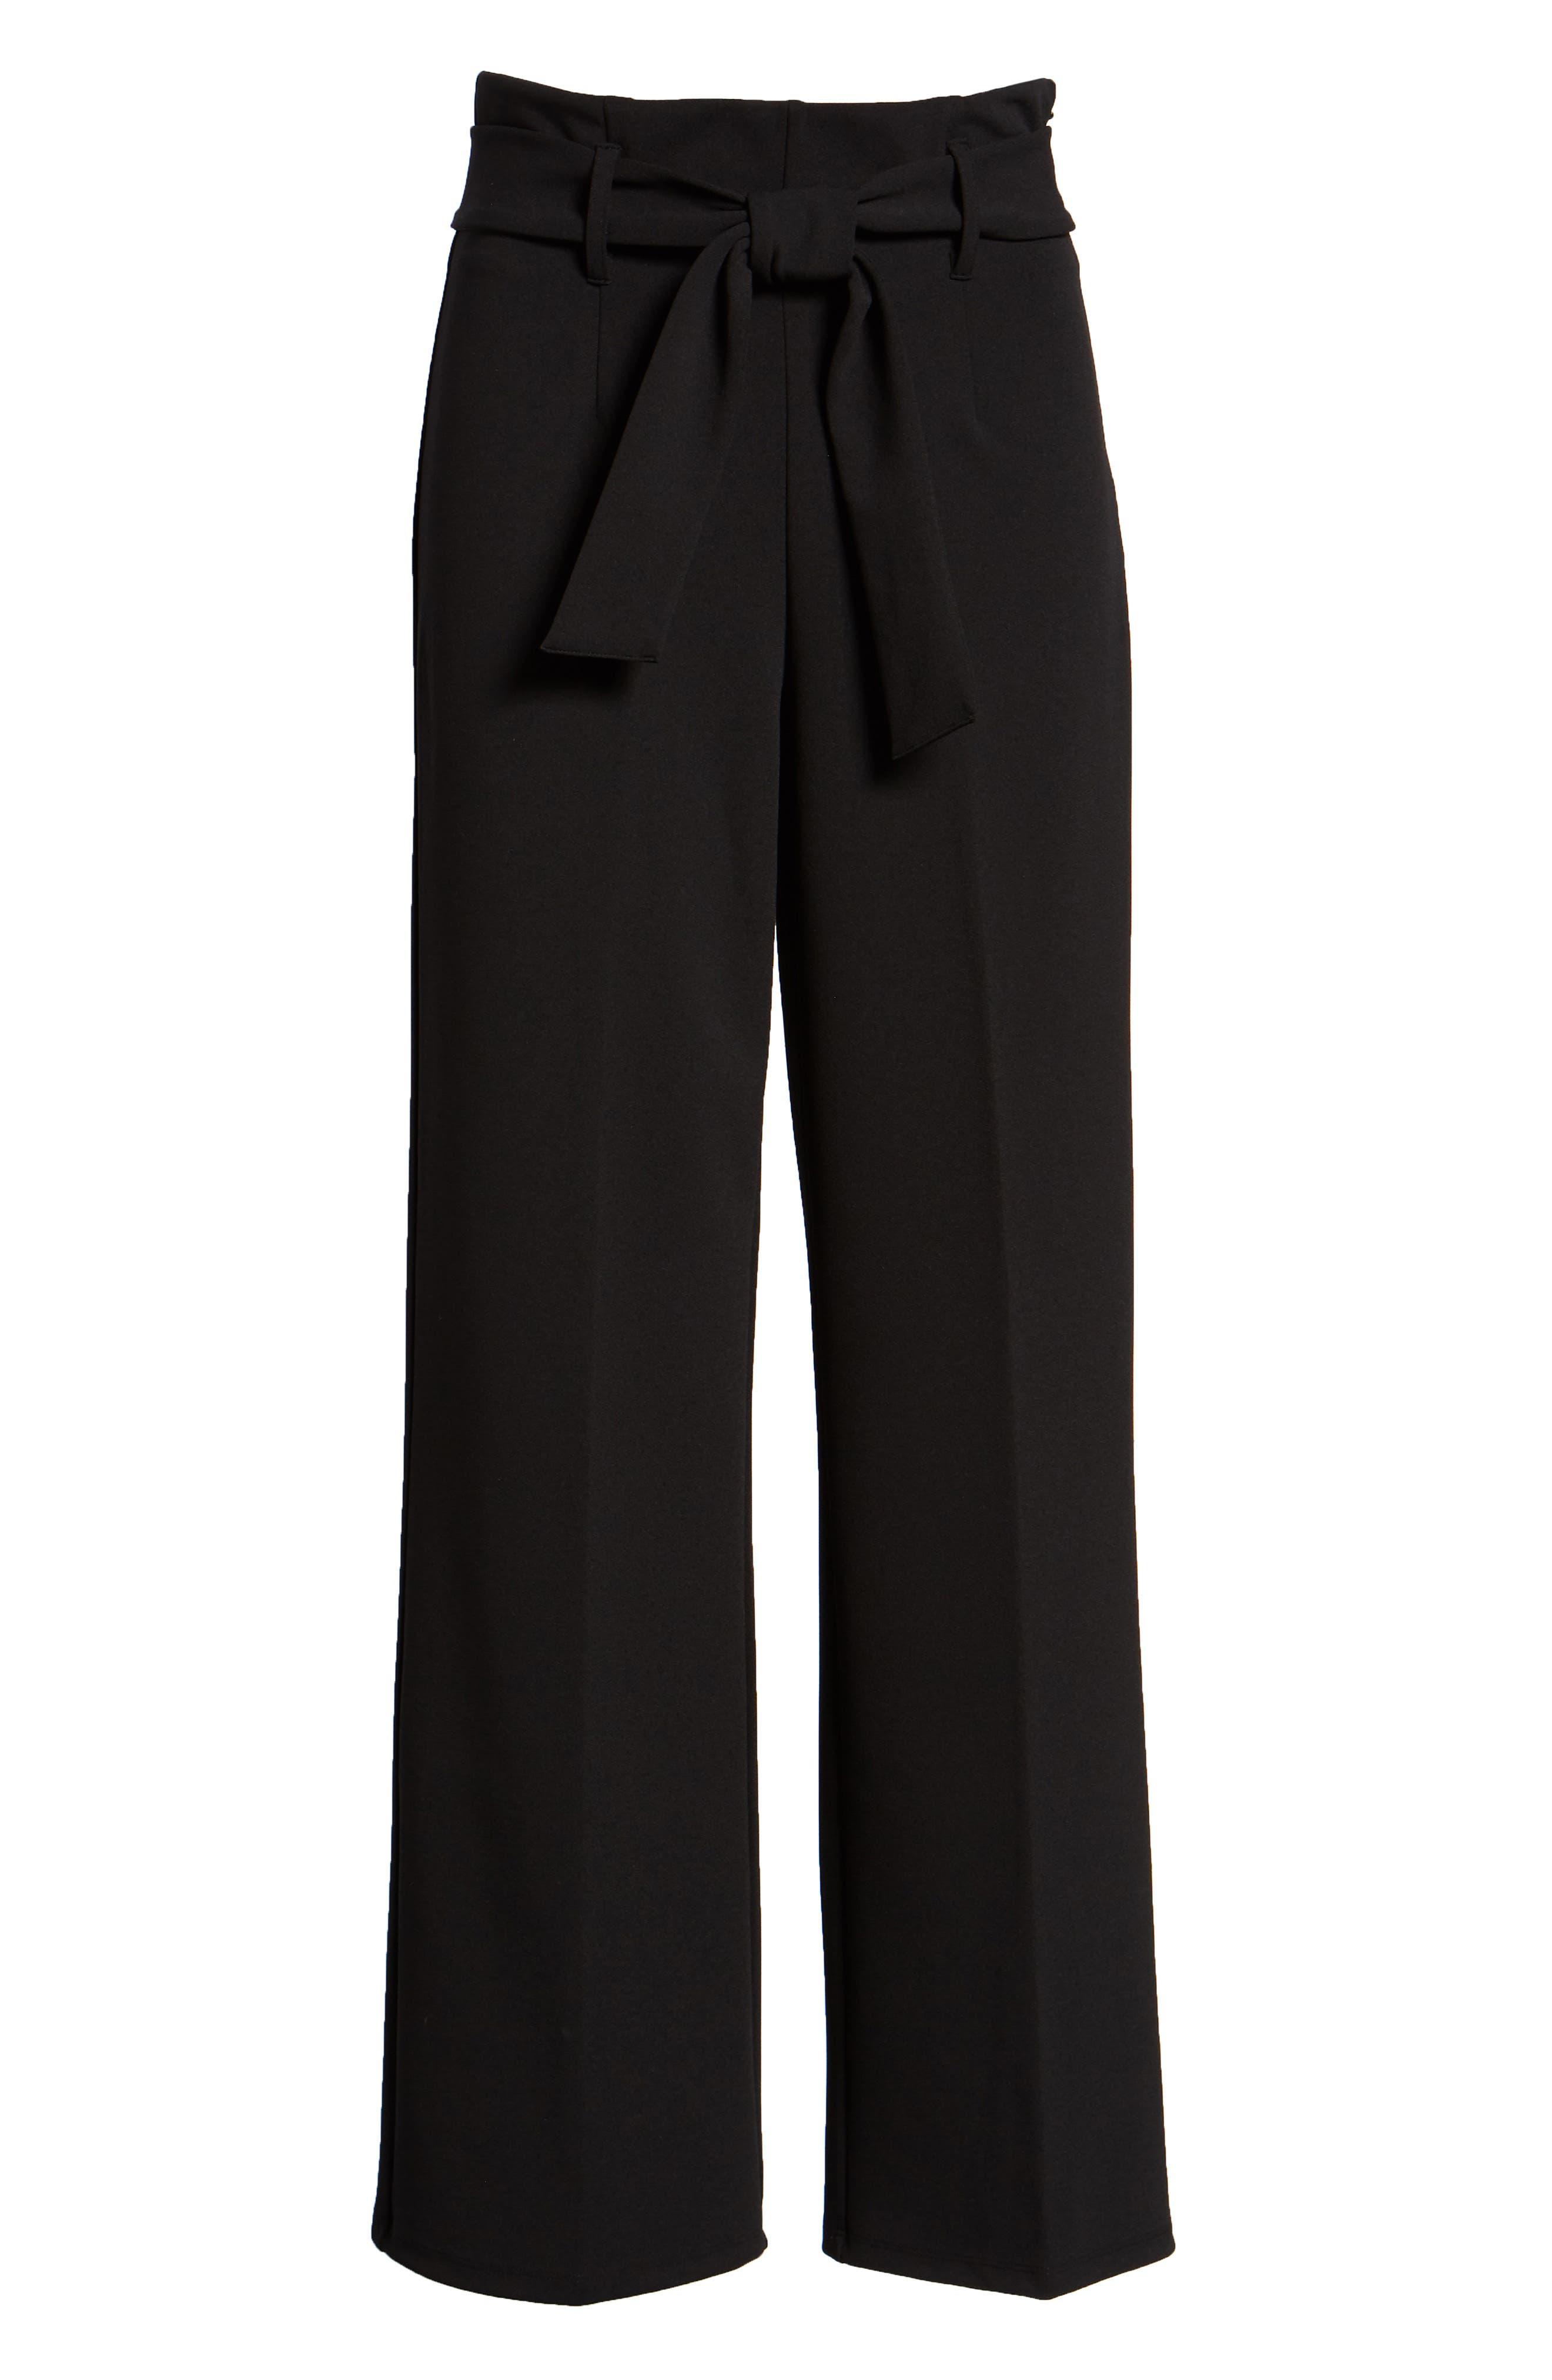 High Waist Belted Pants,                             Alternate thumbnail 7, color,                             BLACK